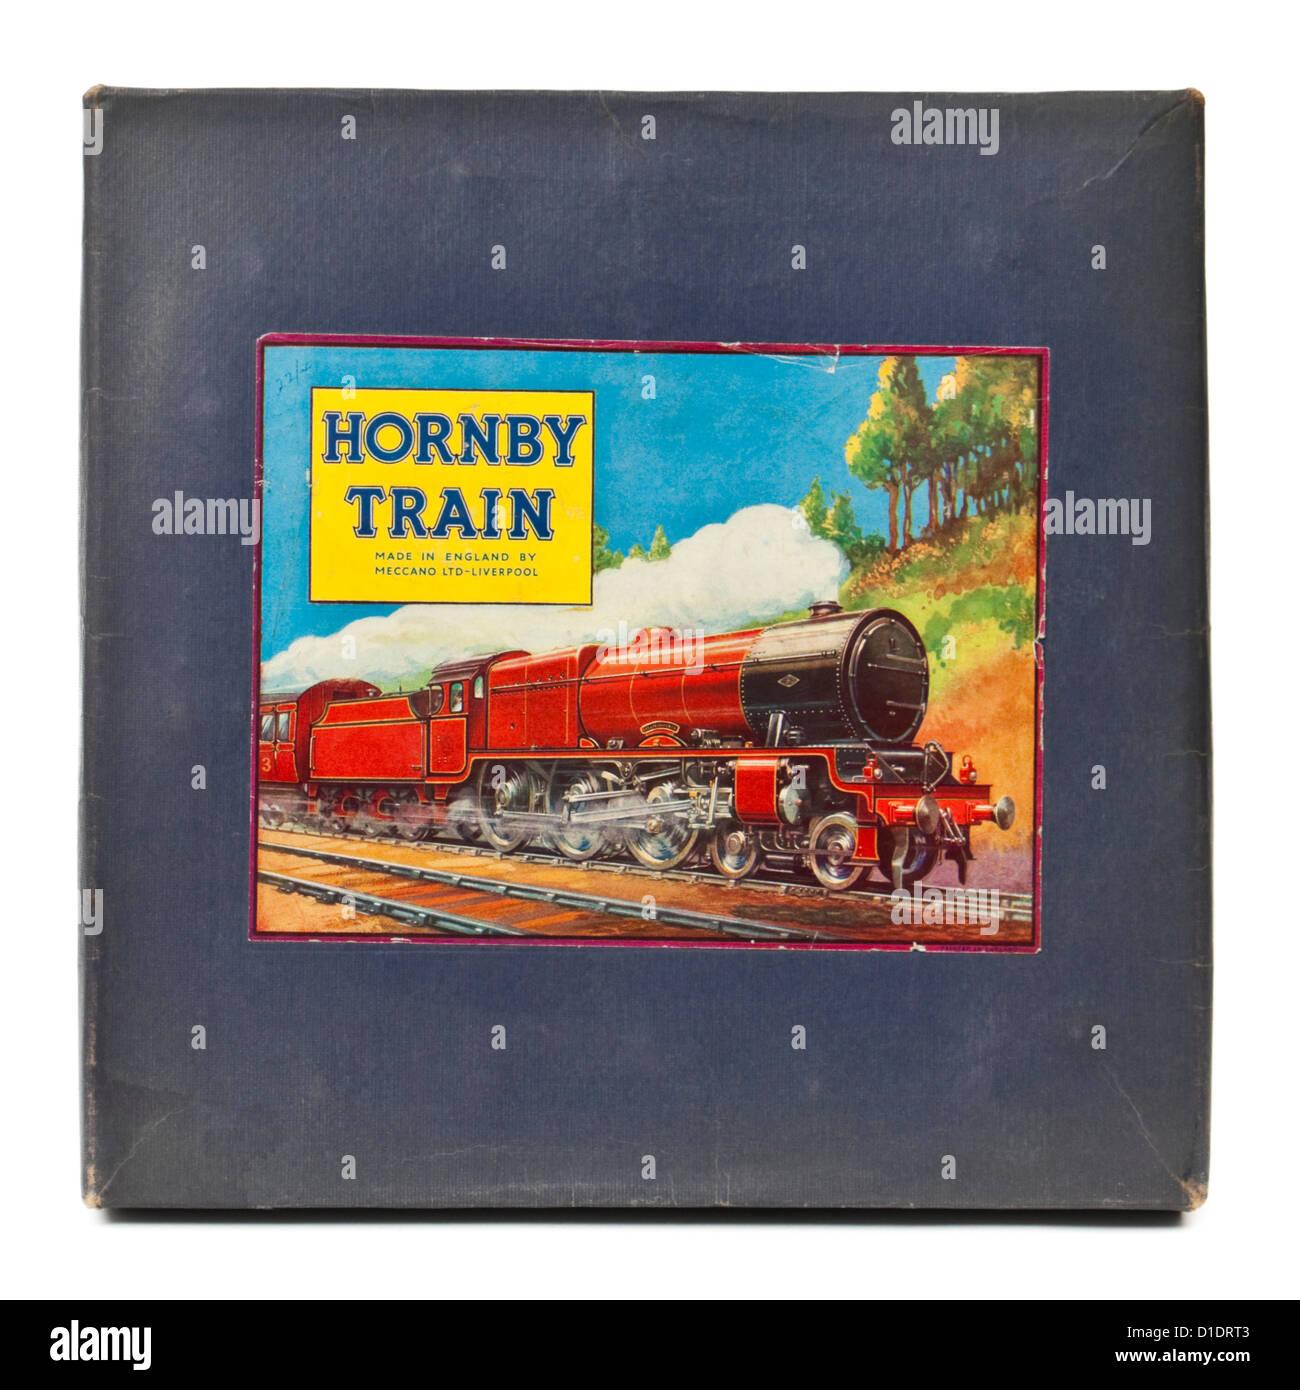 Rare 1950's Hornby clockwork M0 Passenger Train Set with green tinplate locomotive and 'Zena' and 'Joan' - Stock Image